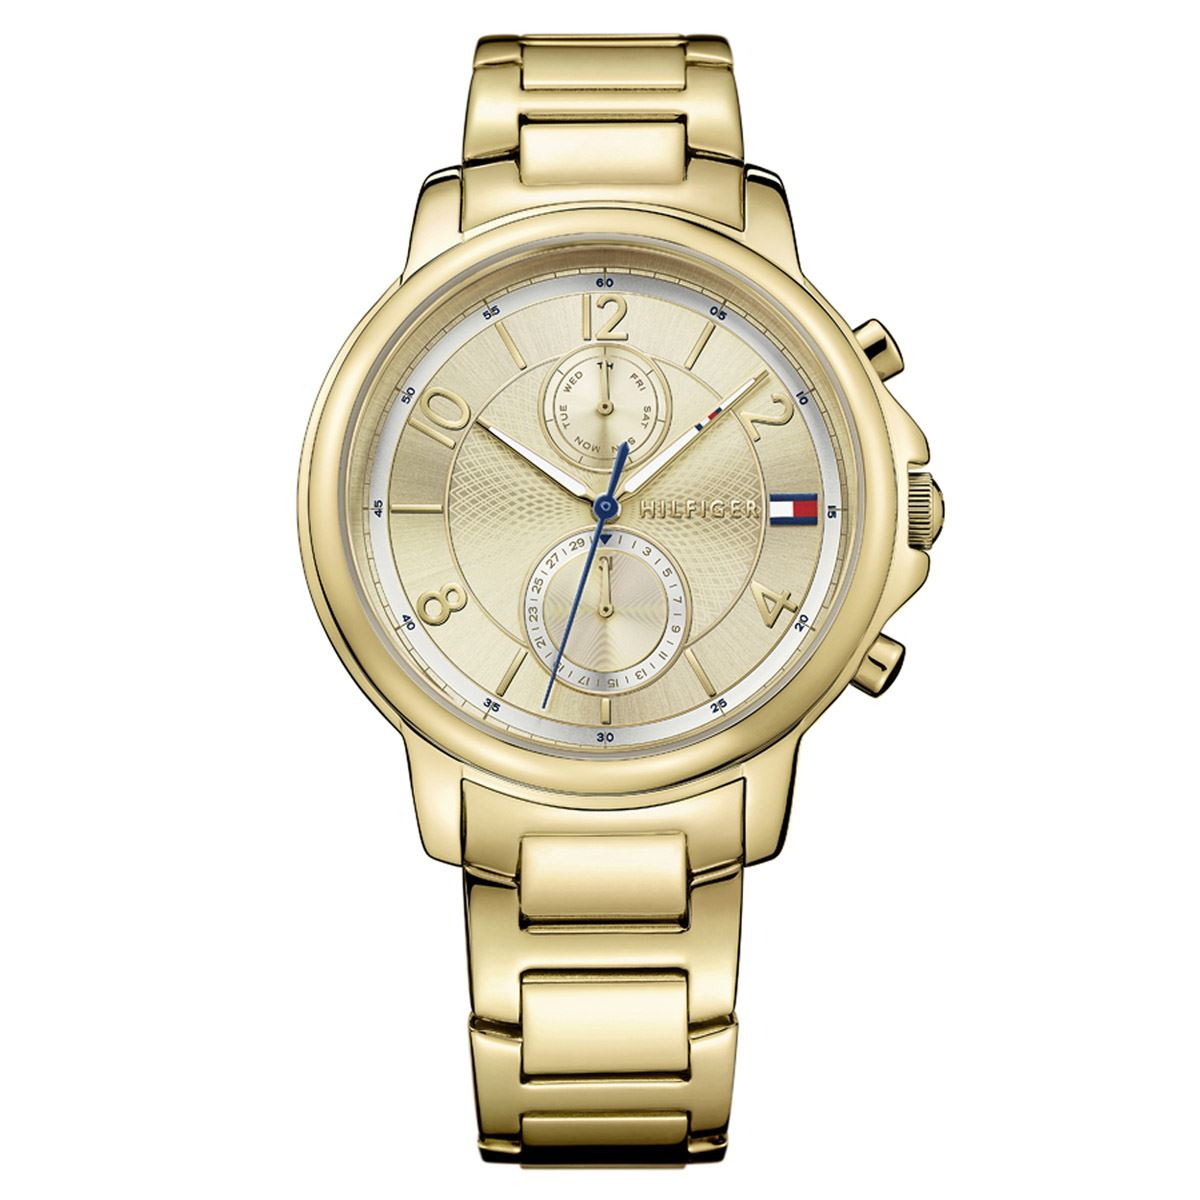 Reloj tommy hilfiger 1781821 dama - Sanborns